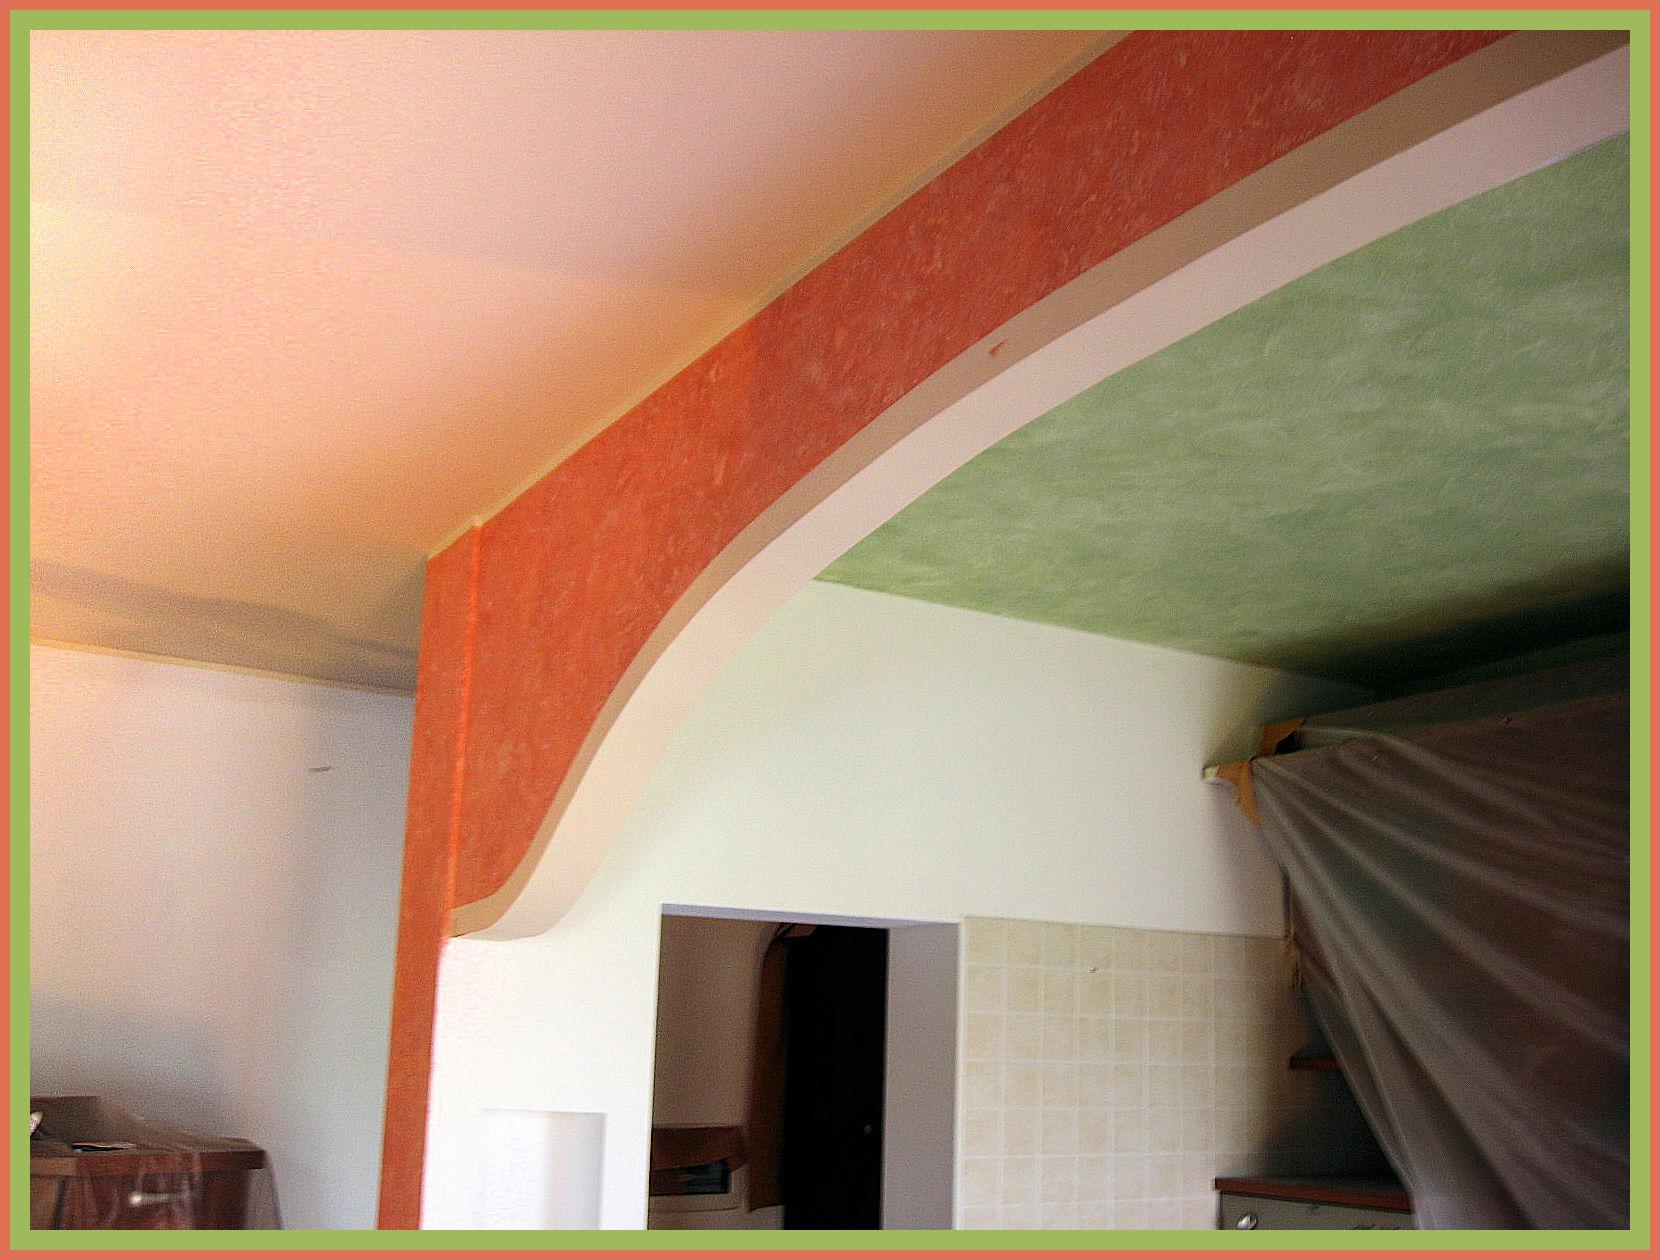 Foto Di Mezzelune In Cartongesso ~ Ispirazione design casa